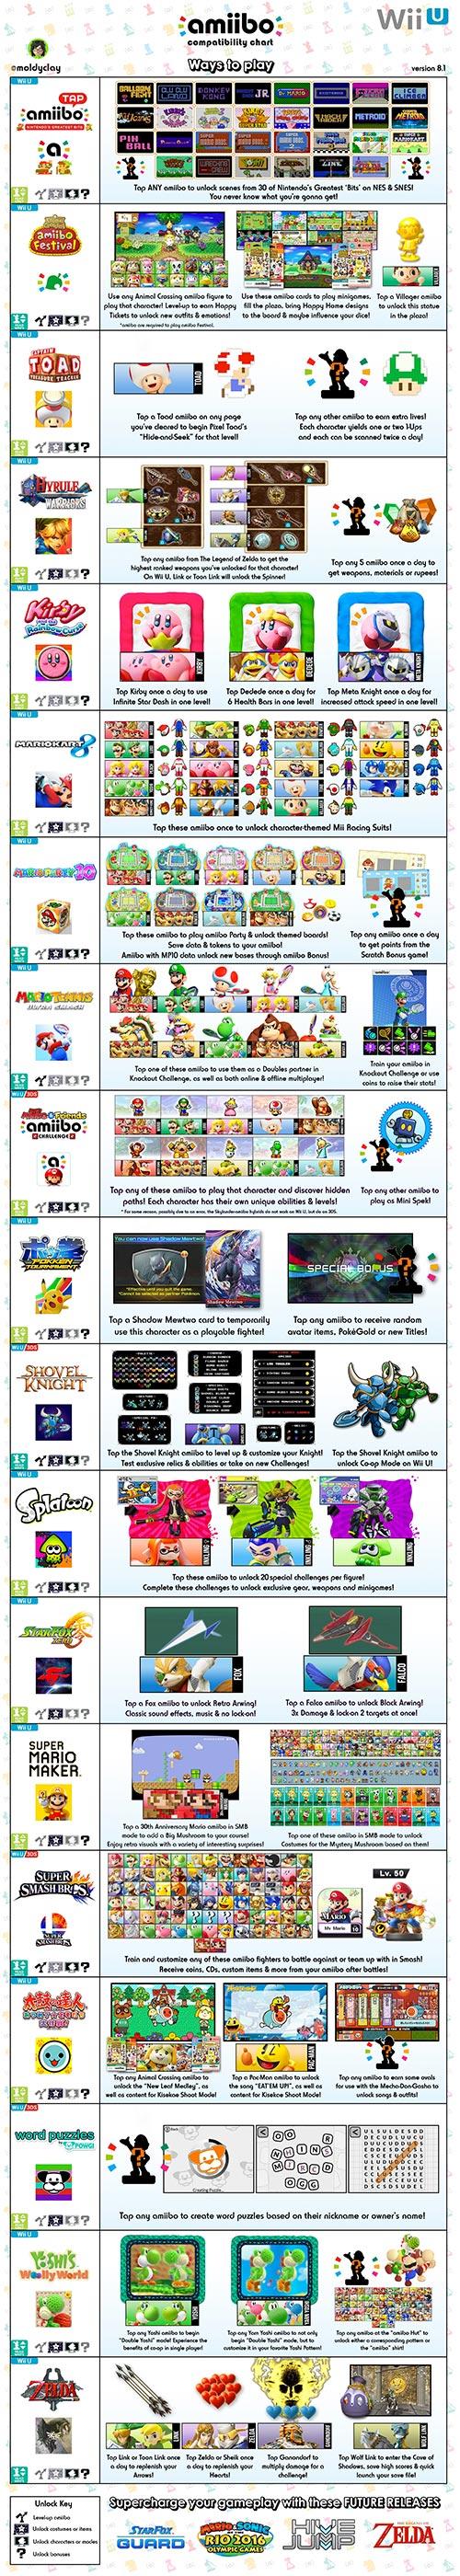 Amiibo Compatibility Chart Wii U version 8.1